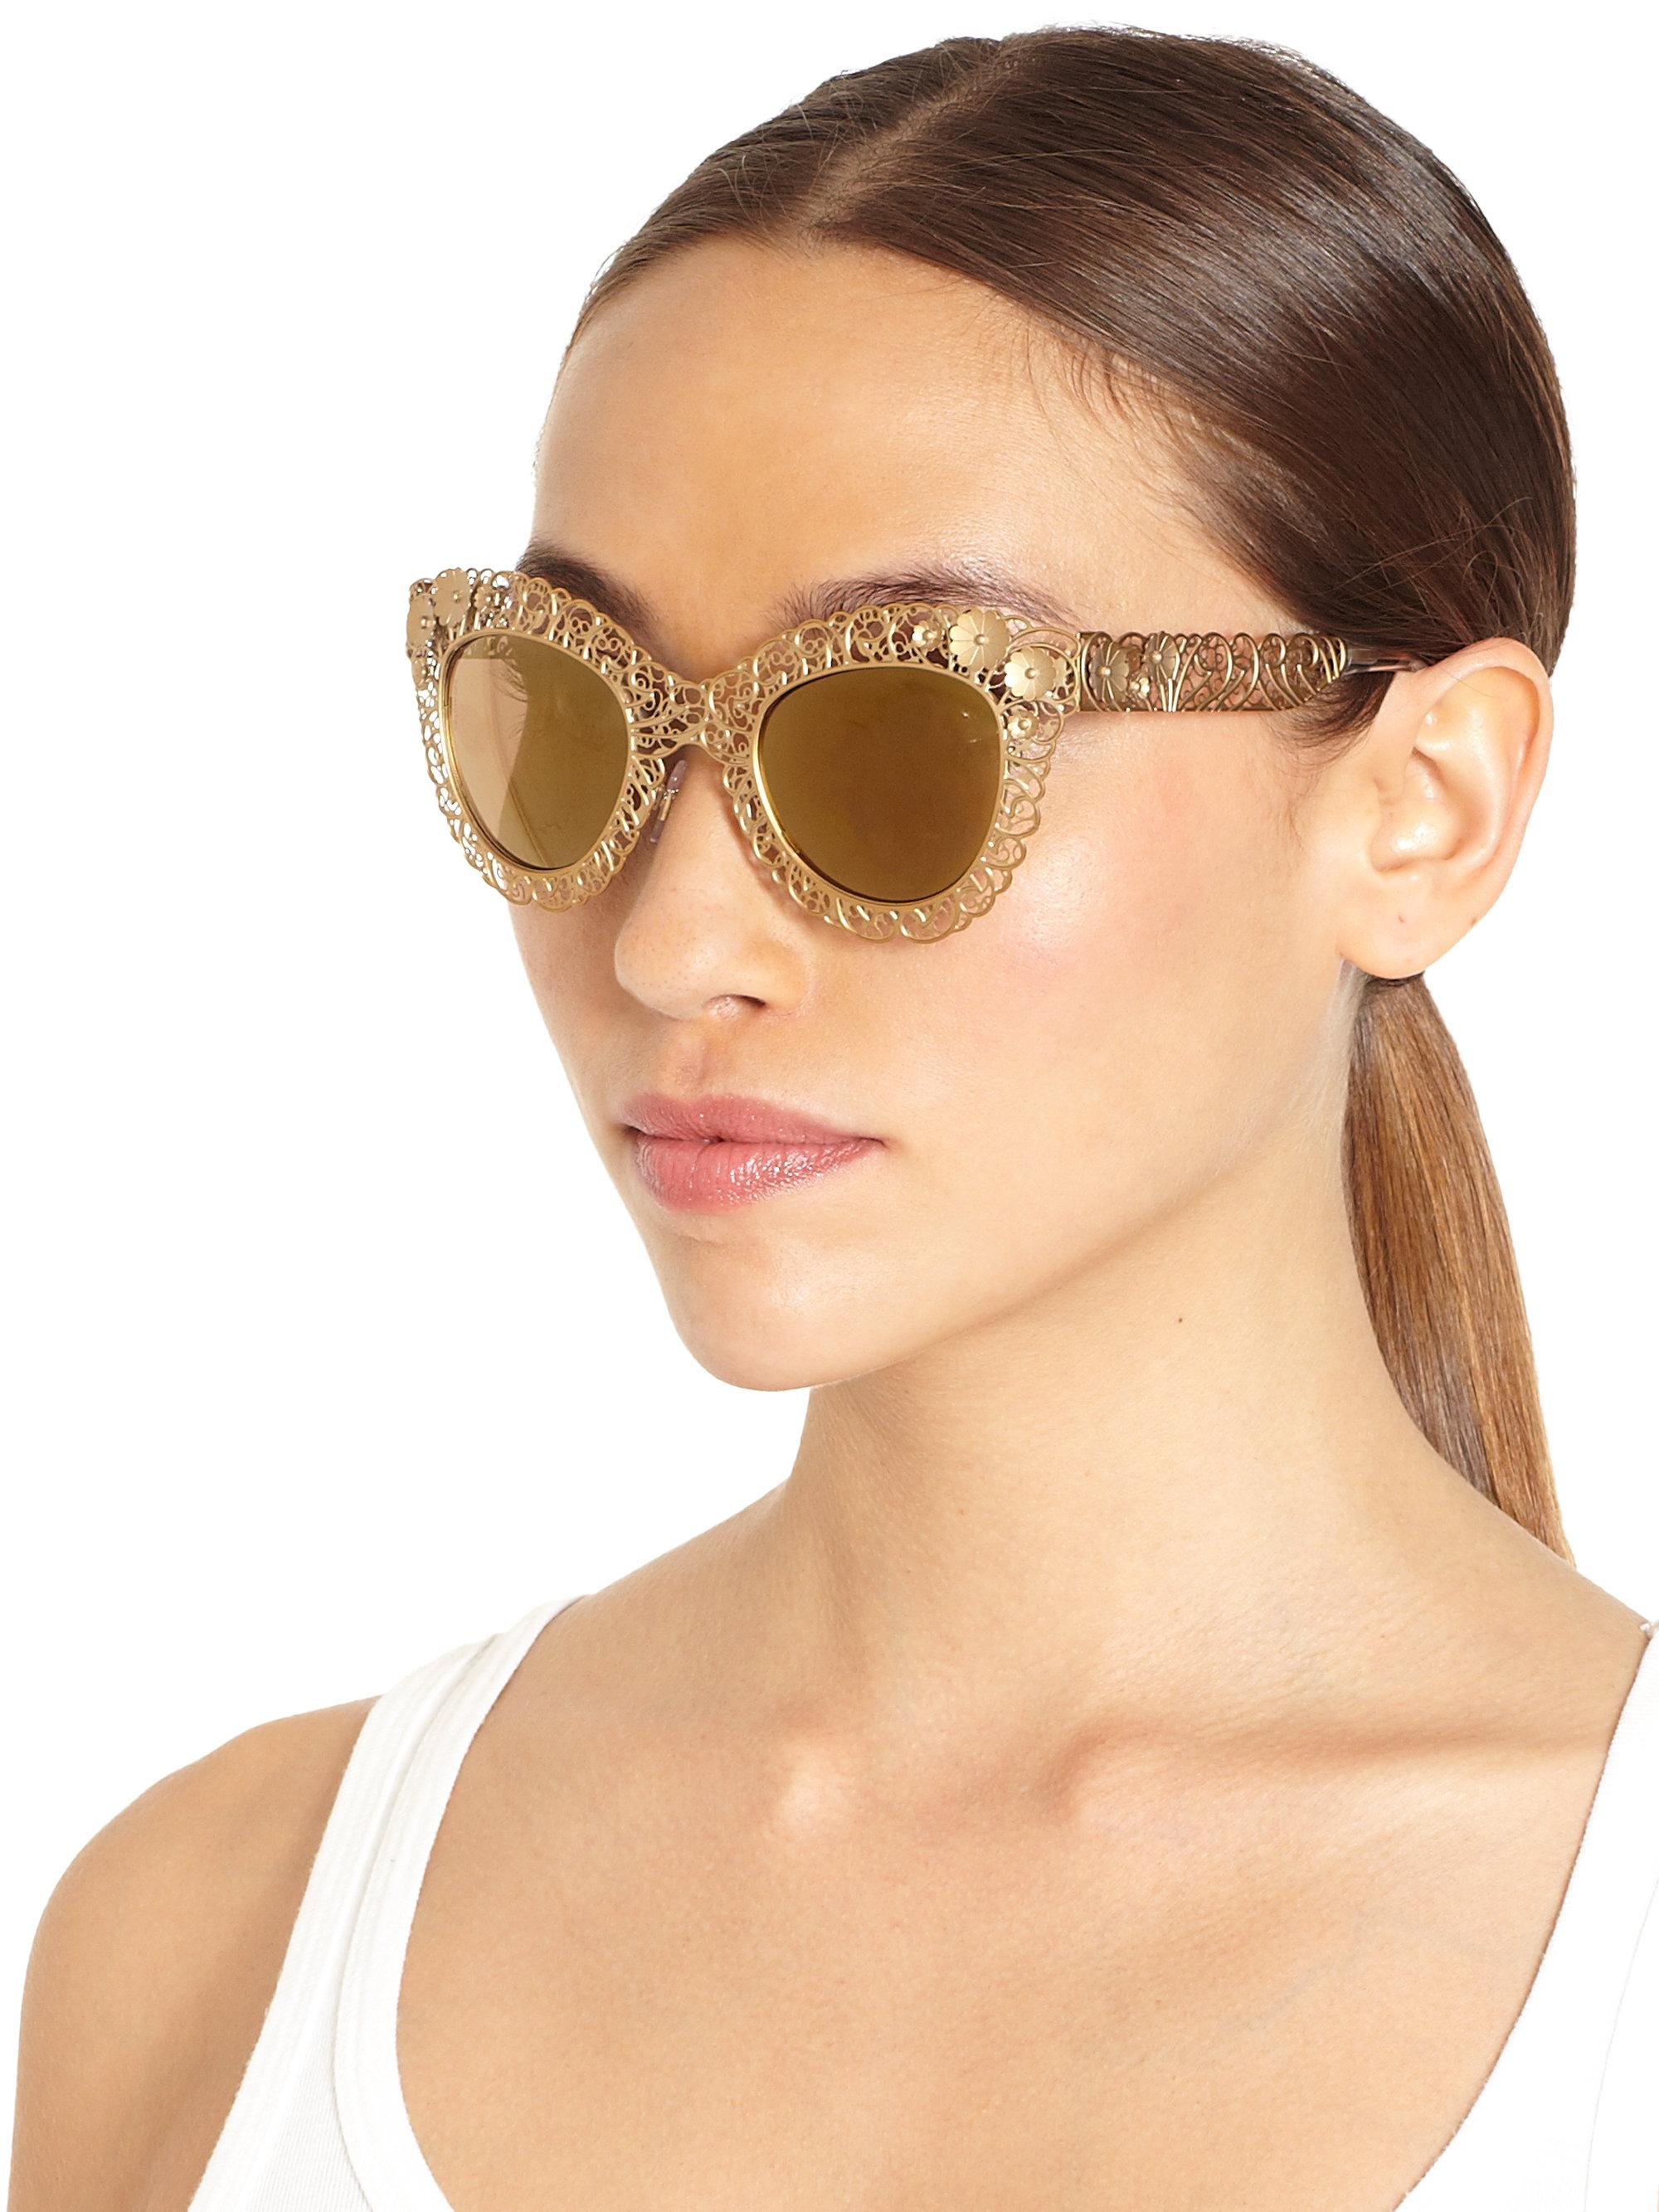 692e4de75648 Lyst - Dolce   Gabbana Sunglasses in Metallic